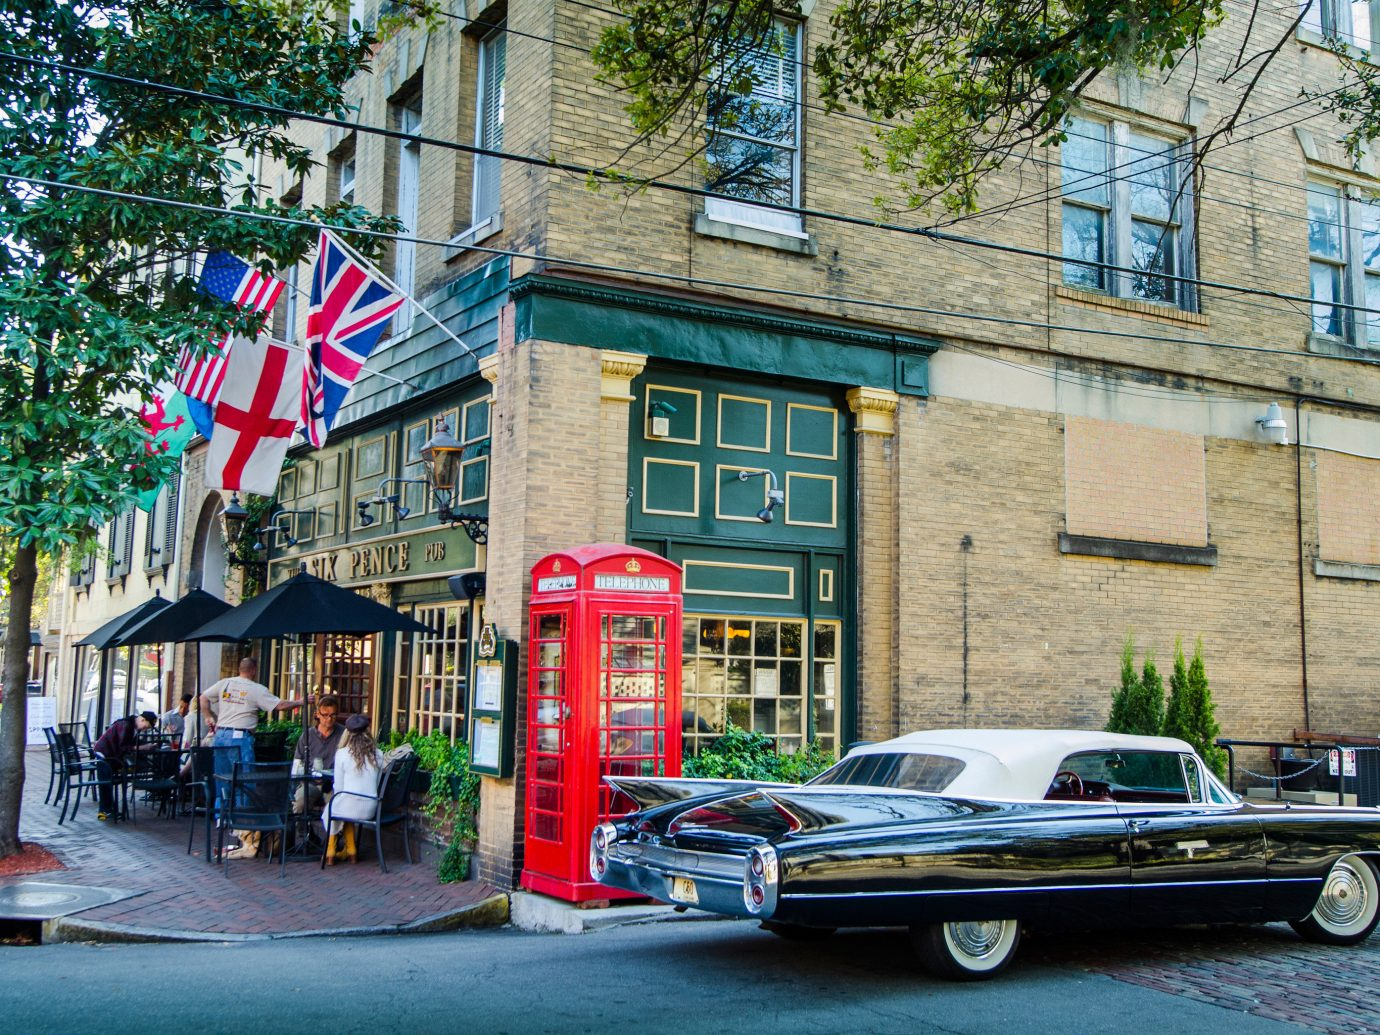 Corner restaurant and vintage car in Savannah, GA